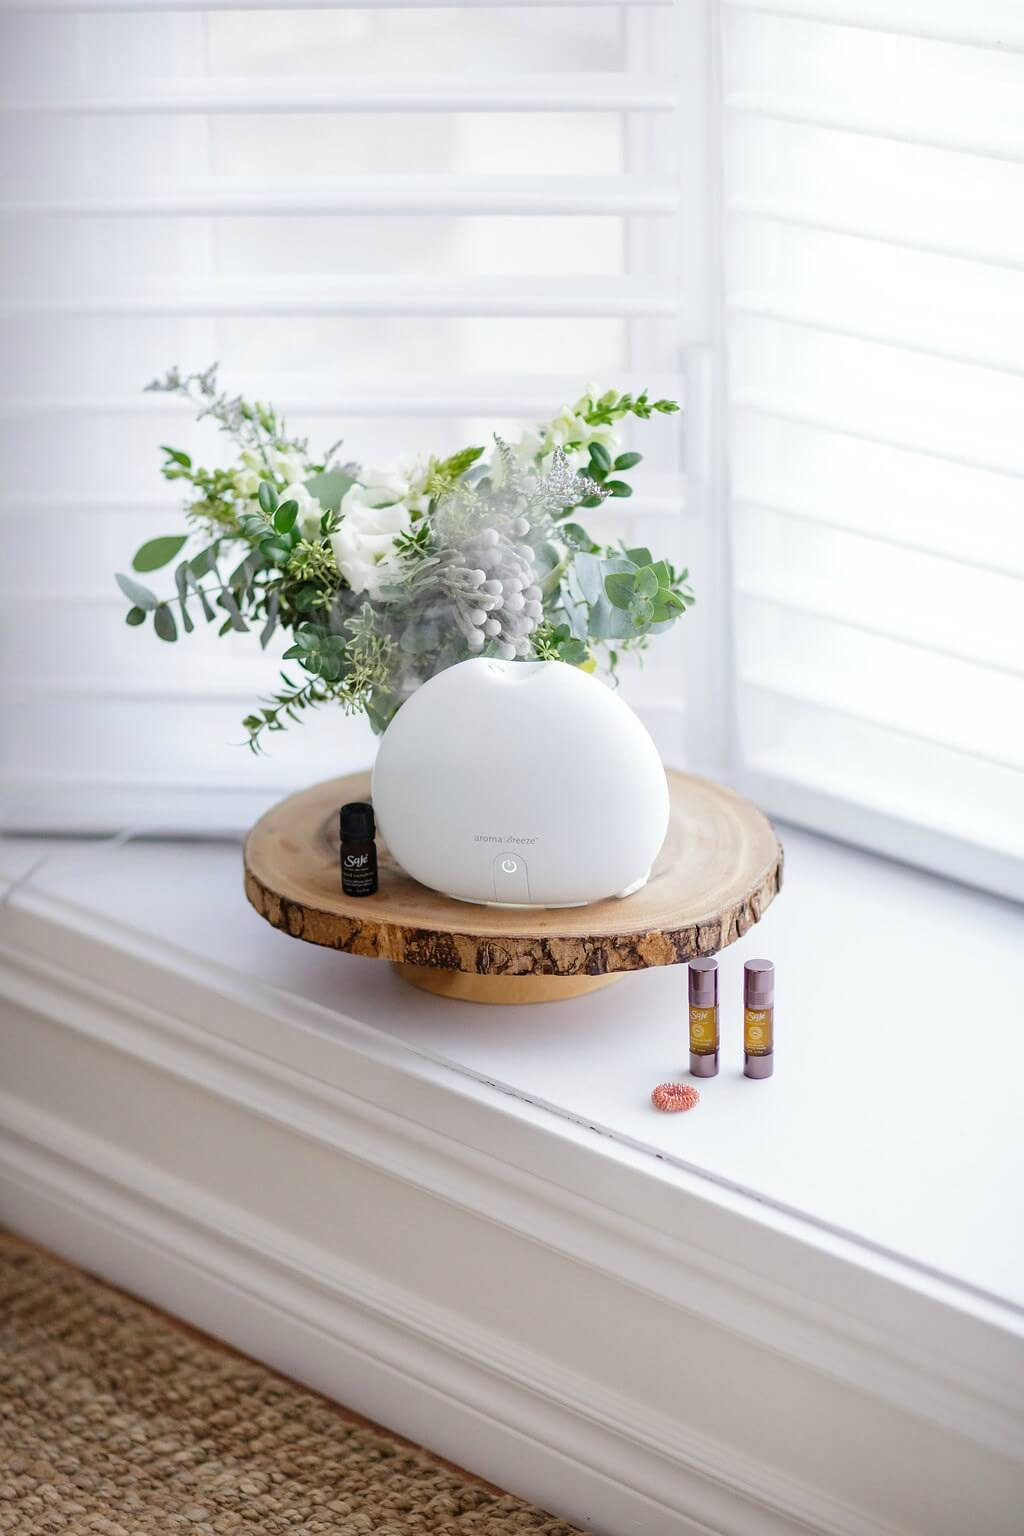 Aroma Box Atop Wooden Slab